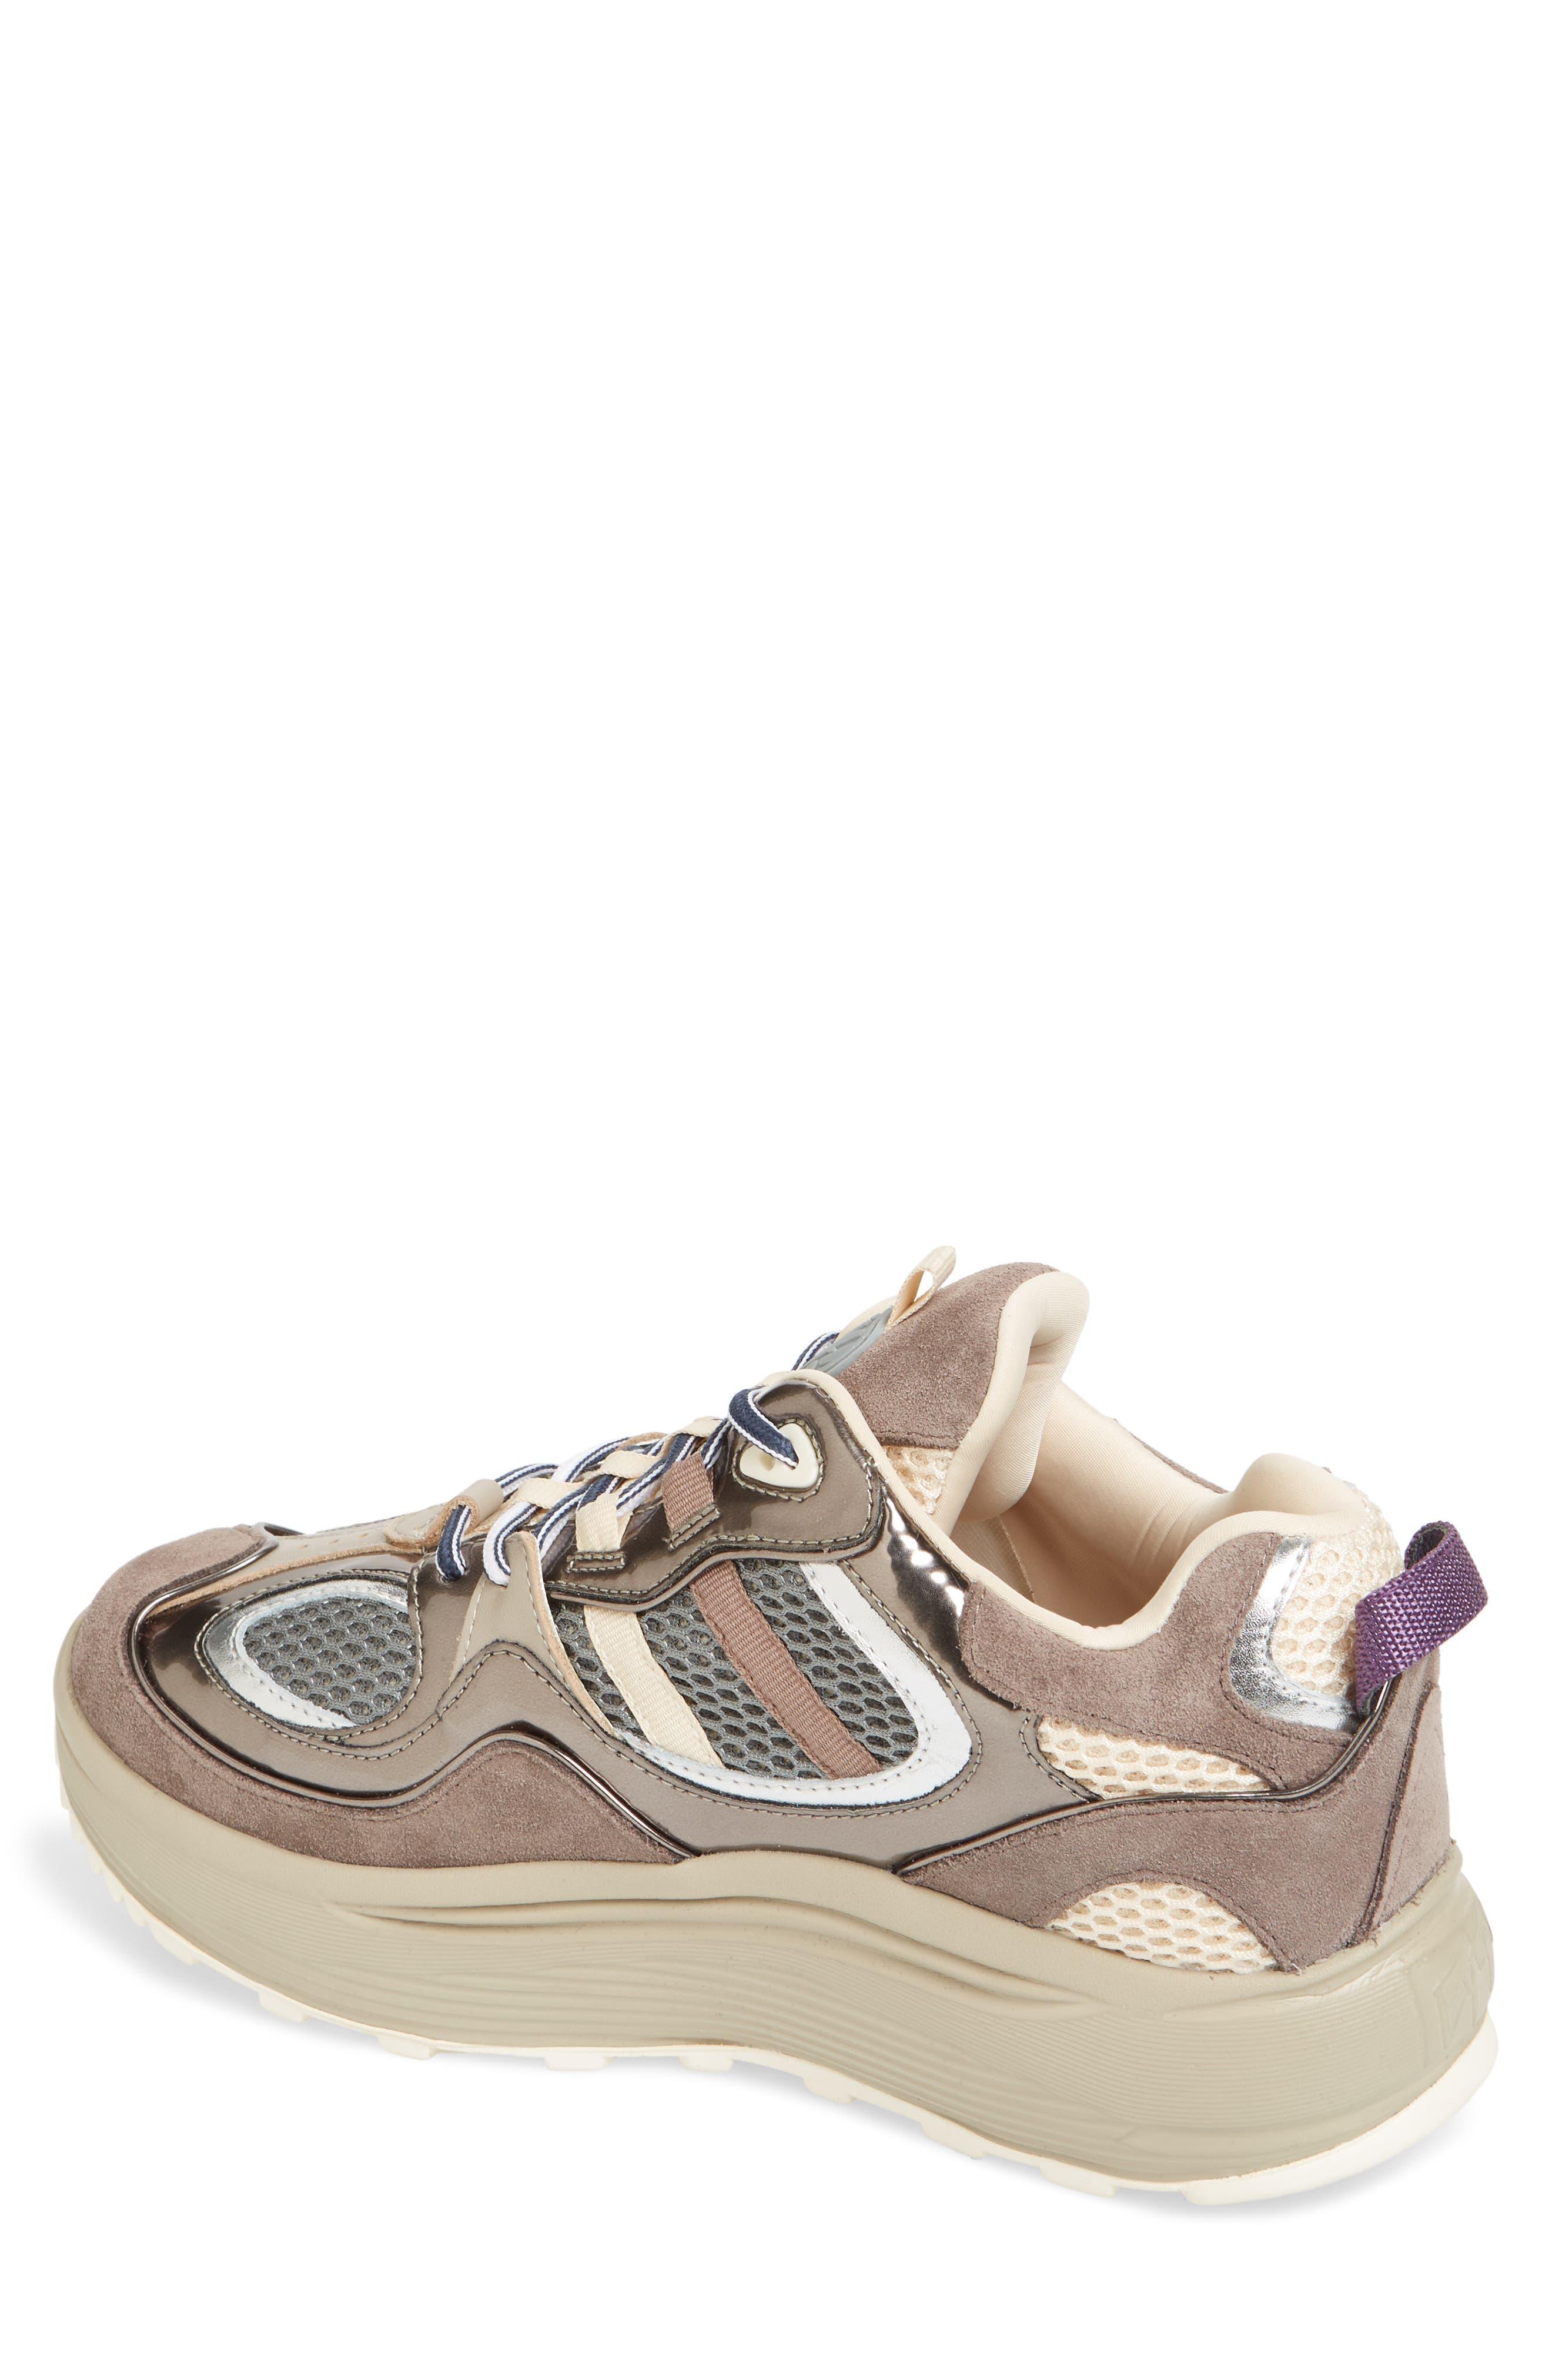 Jet Turbo Flatform Sneaker,                             Alternate thumbnail 2, color,                             060